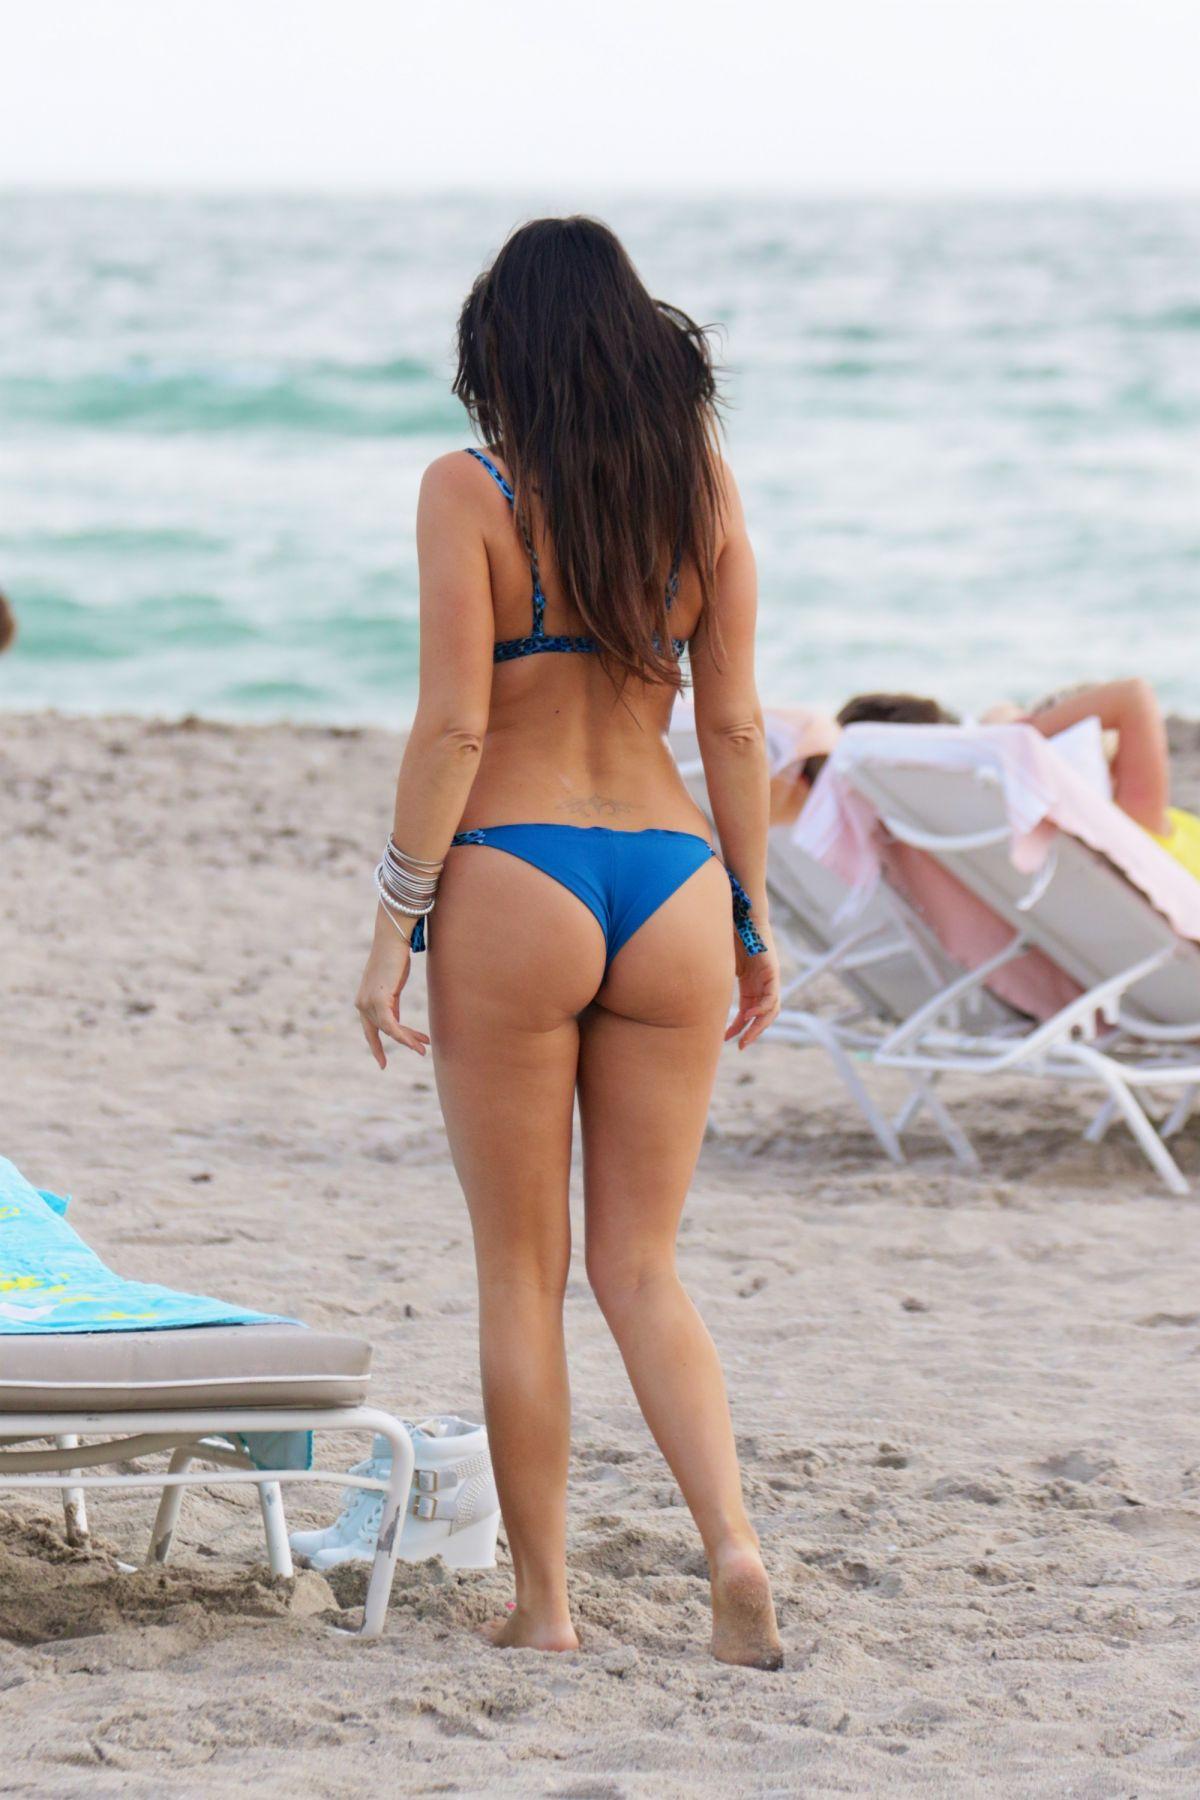 claudia romani in blue bikini at a beach in miami 11/30/2015